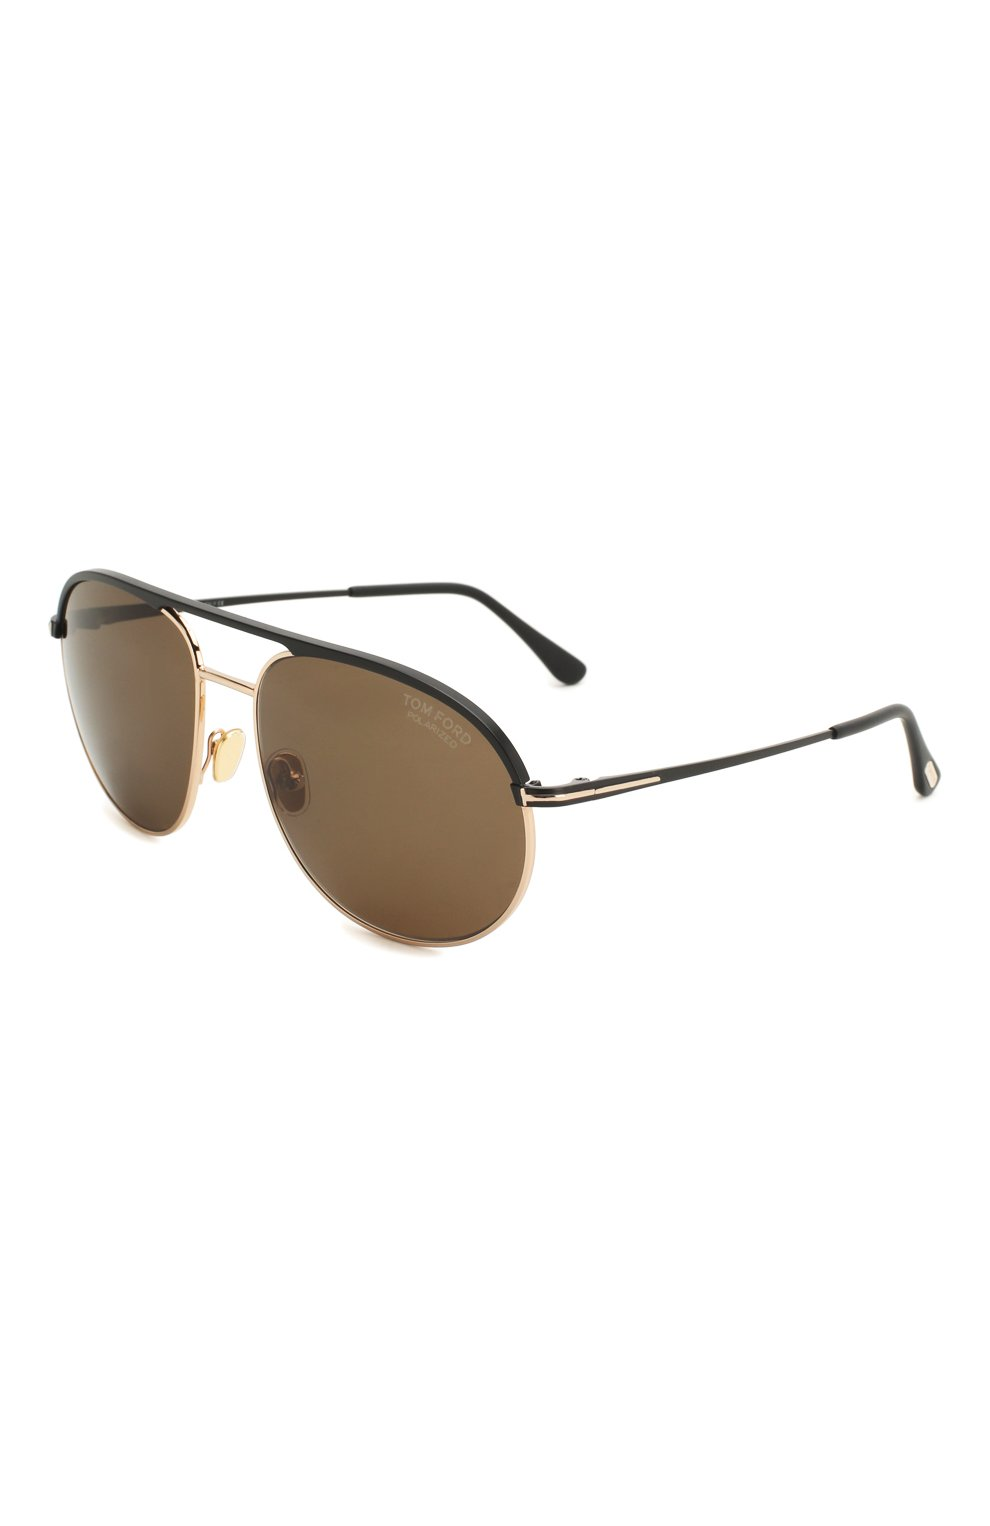 Мужские солнцезащитные очки TOM FORD черного цвета, арт. TF772   Фото 1